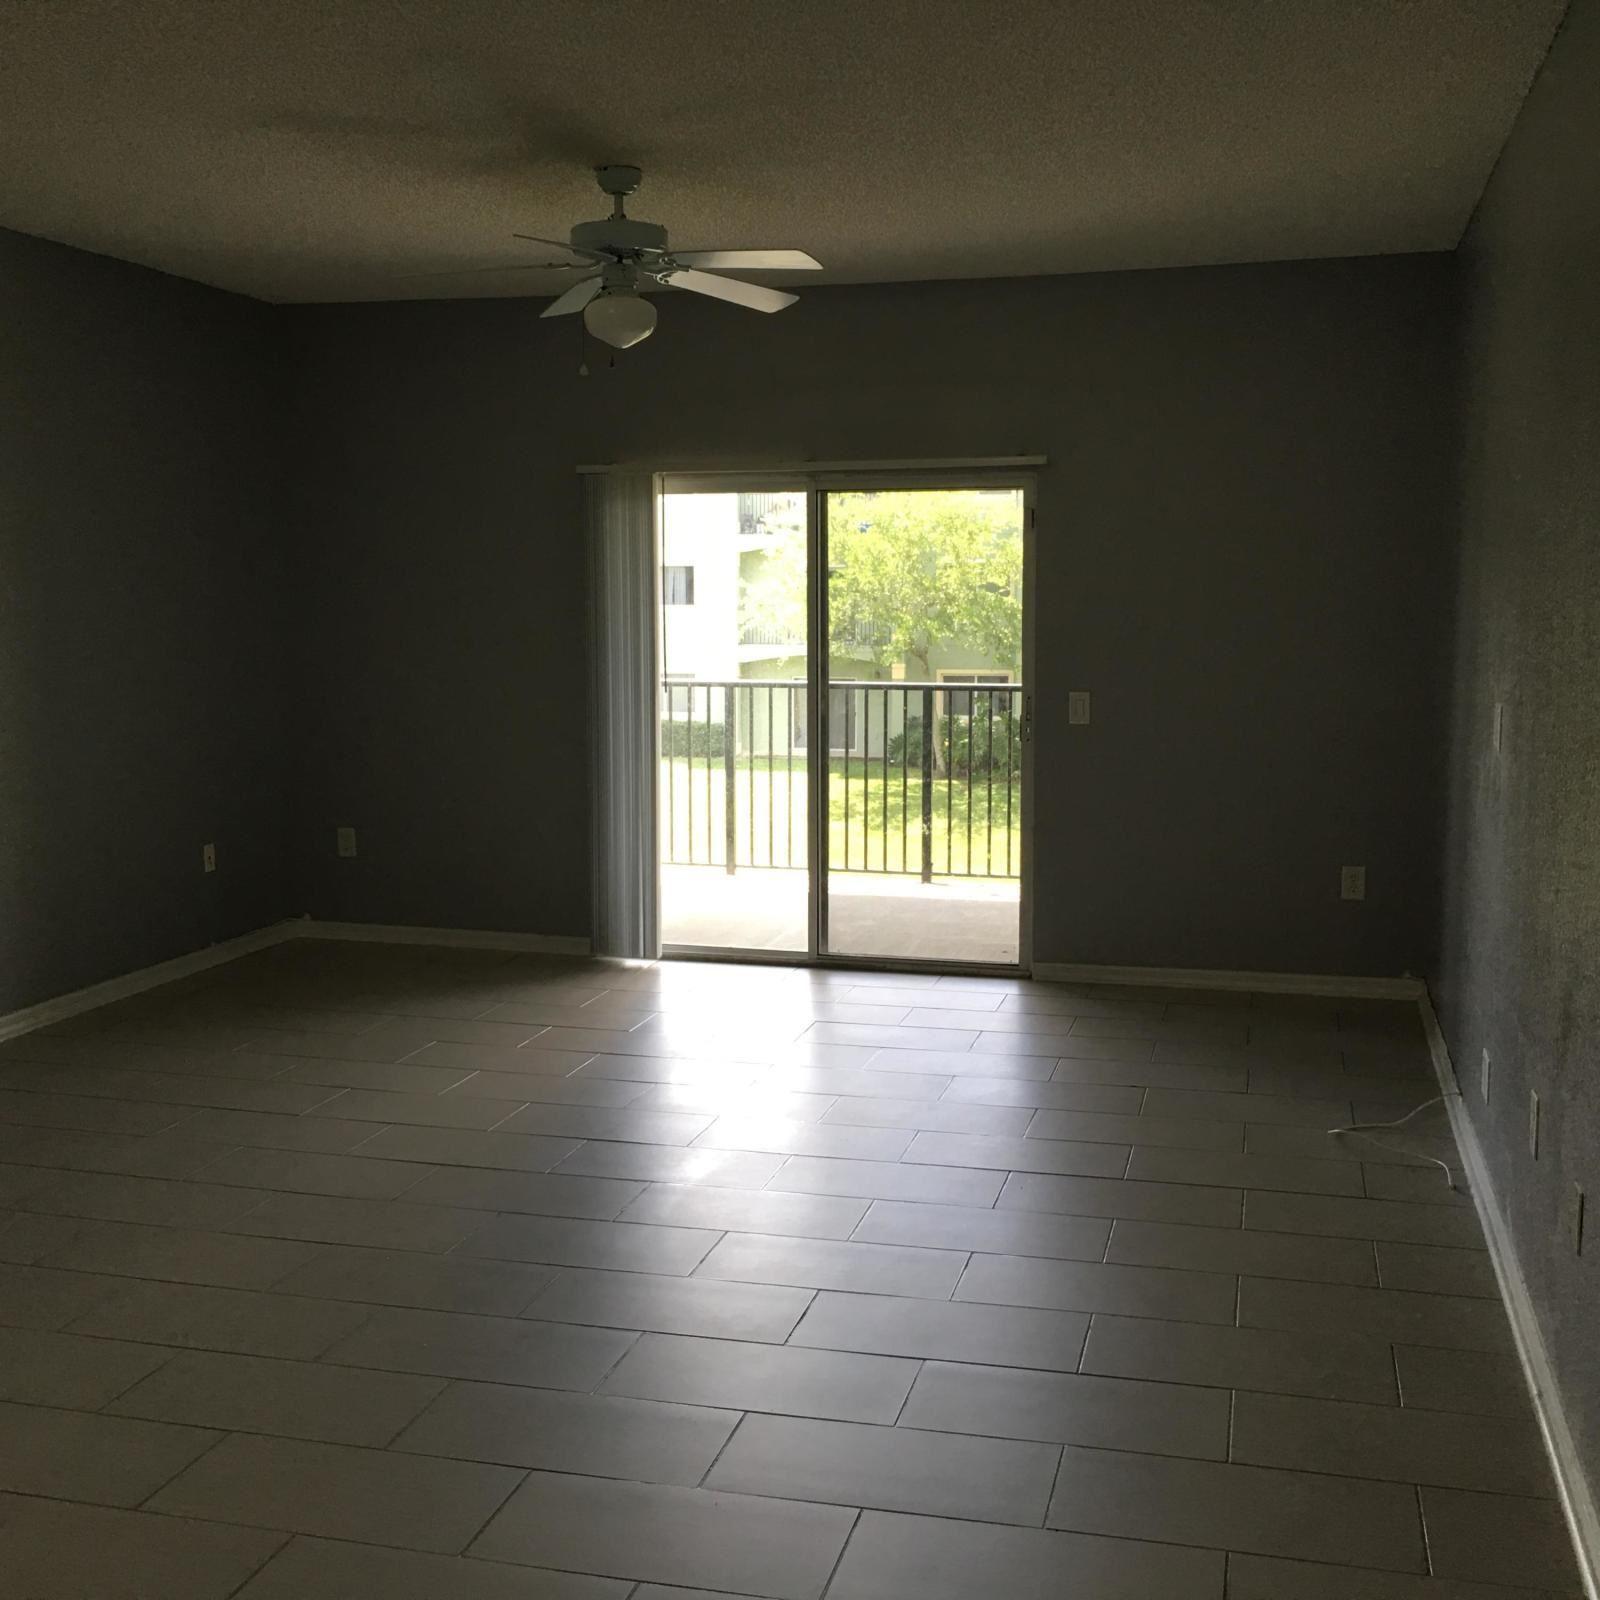 320 Crestwood Circle #206, Royal Palm Beach, FL 33411 - #: RX-10670252